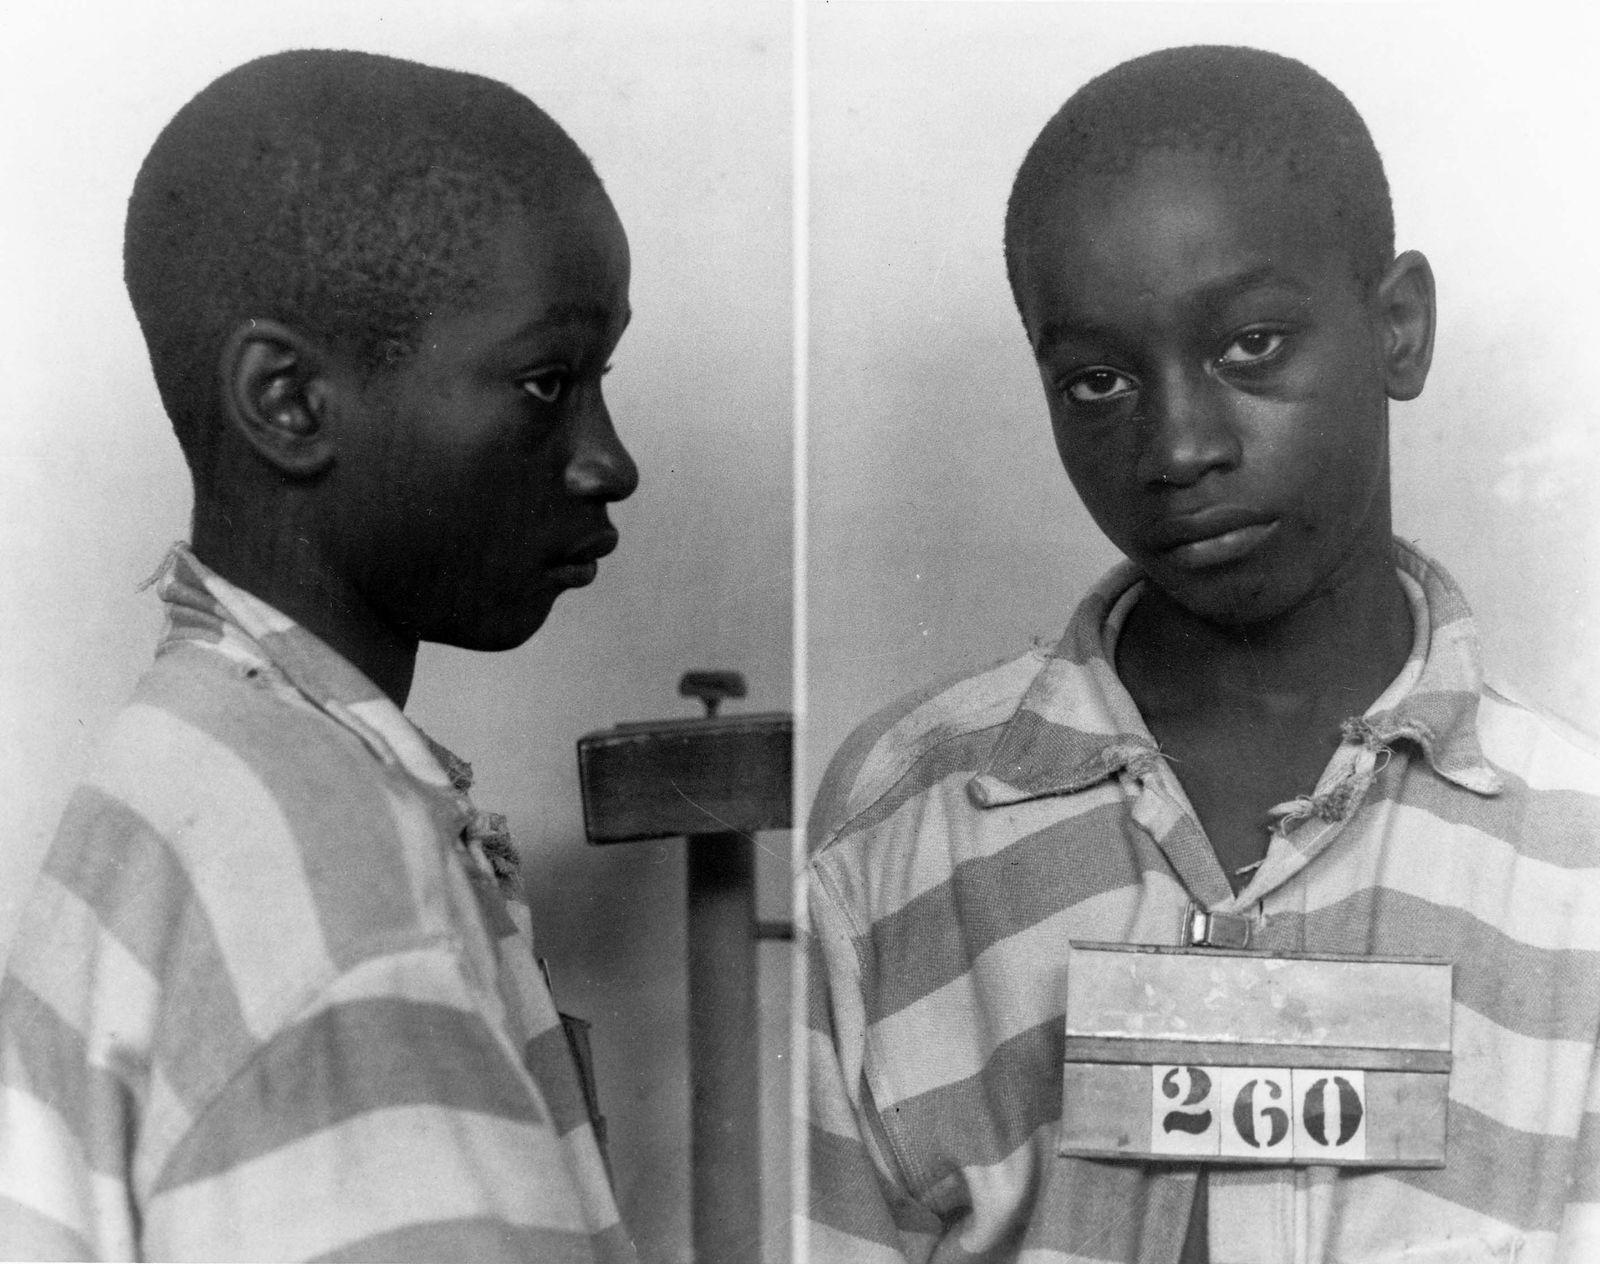 George Stinney/ Hinrichtung 1944/ Todesstrafe